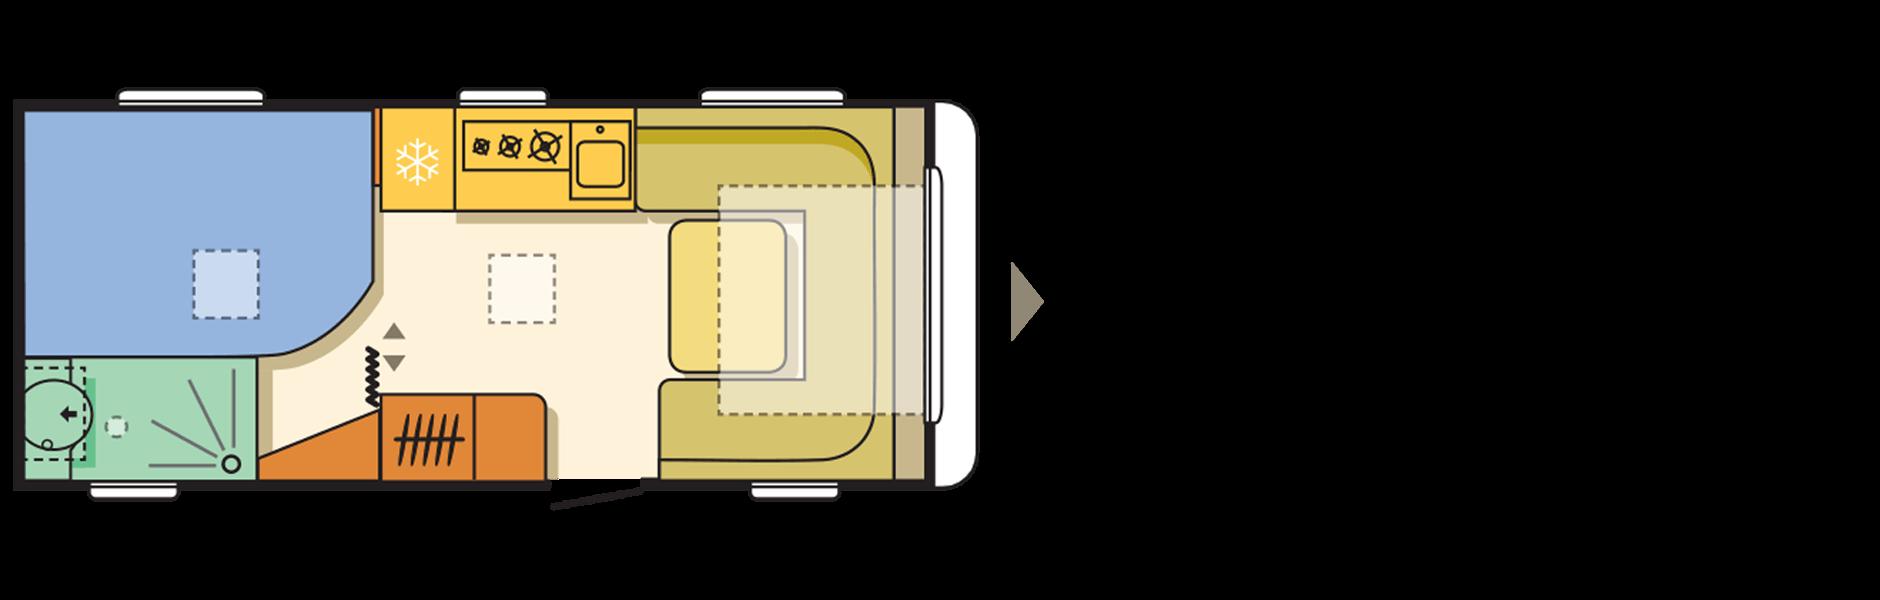 קרוואן דגם אדורה